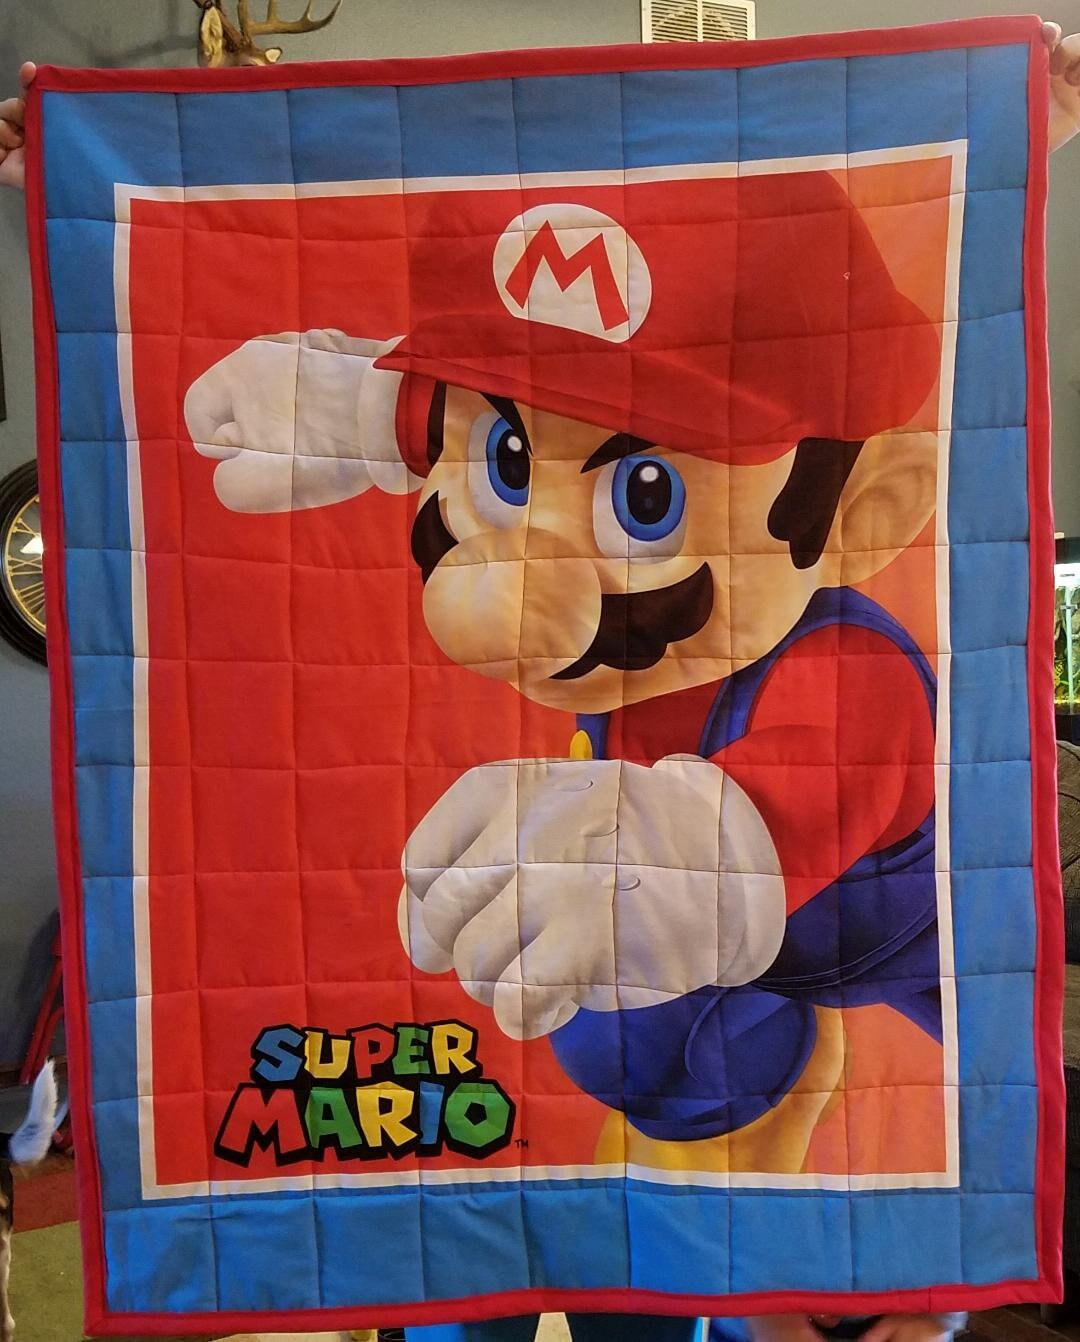 Install the latest offline installer version of old super mario bros for windows pc / laptop. Quilt Mario Bros Etsy